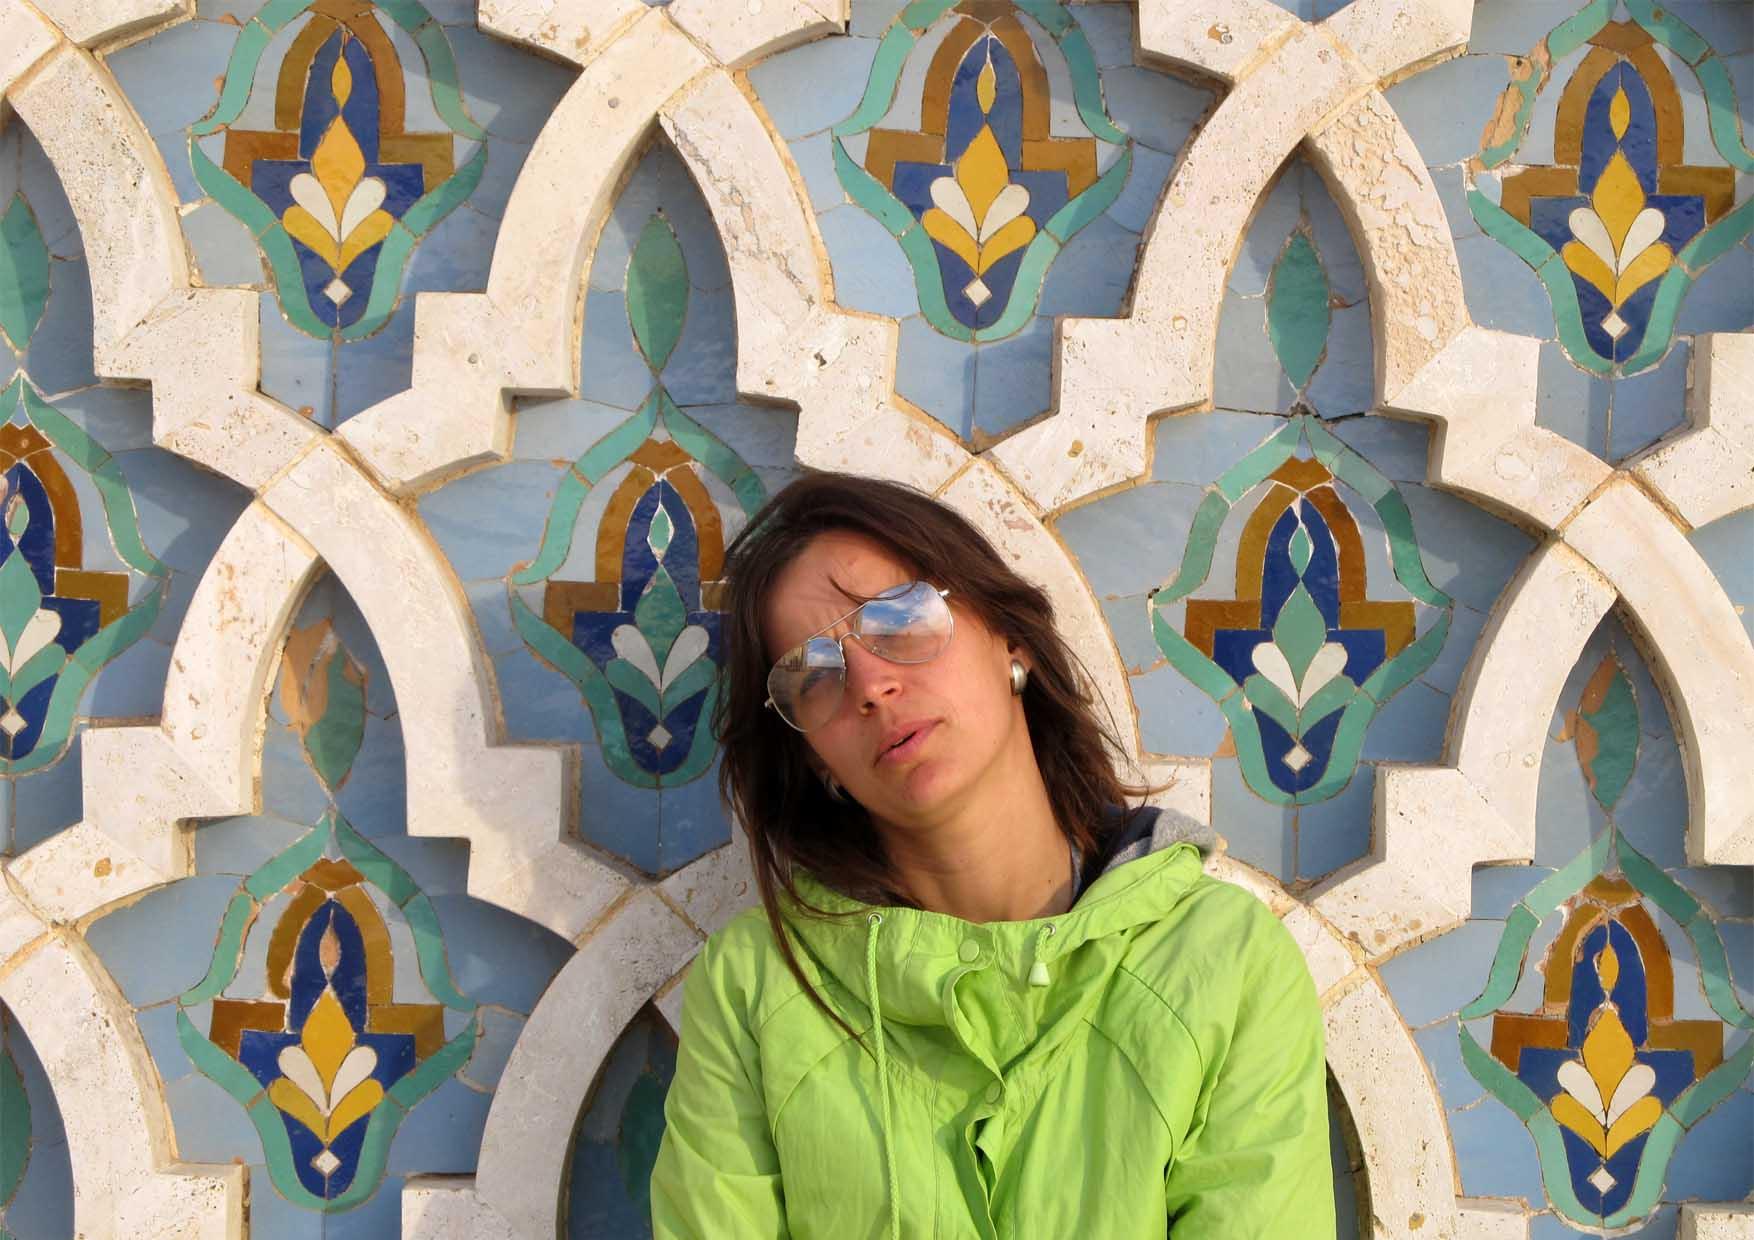 78 maroko kazablanka velika dzamija dragana